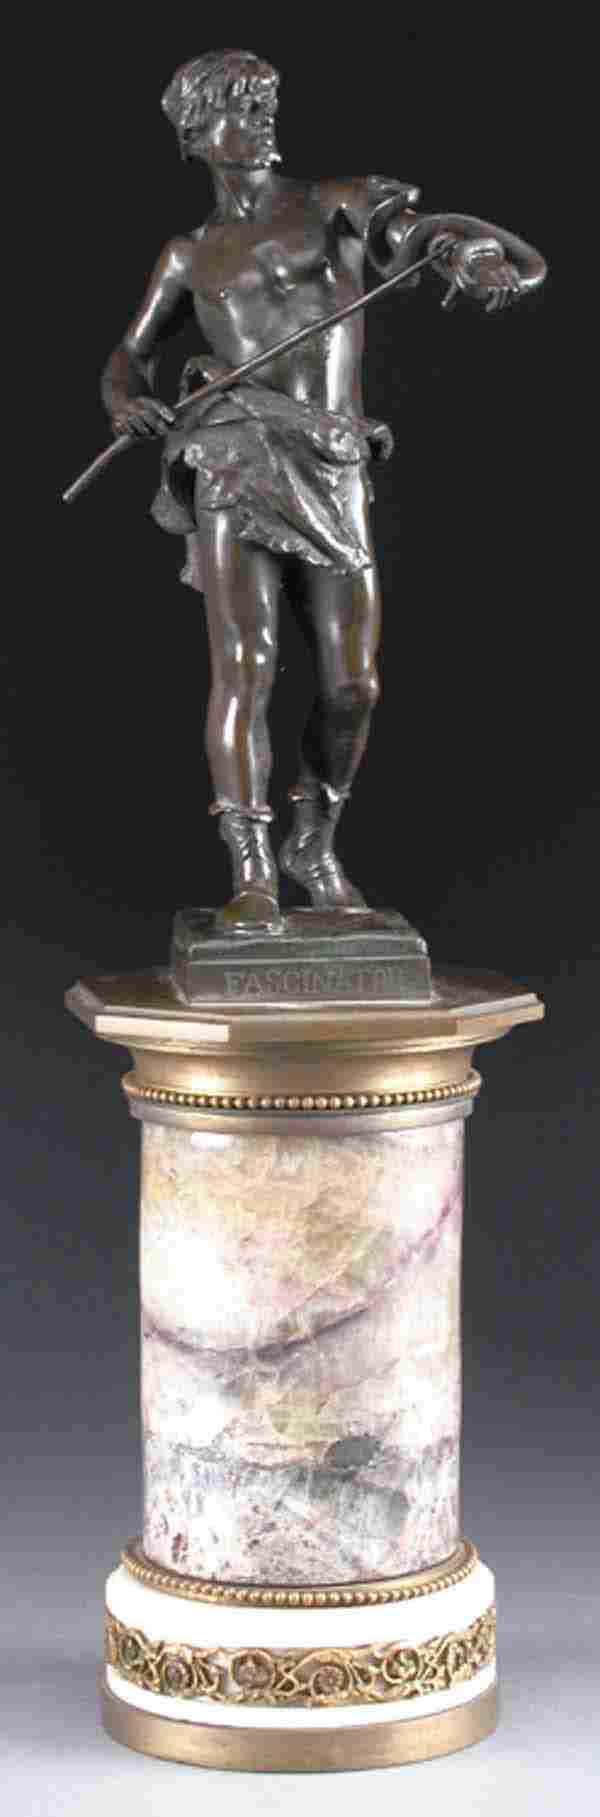 Blue John Gilt Bronze Mounted Table Pedestal